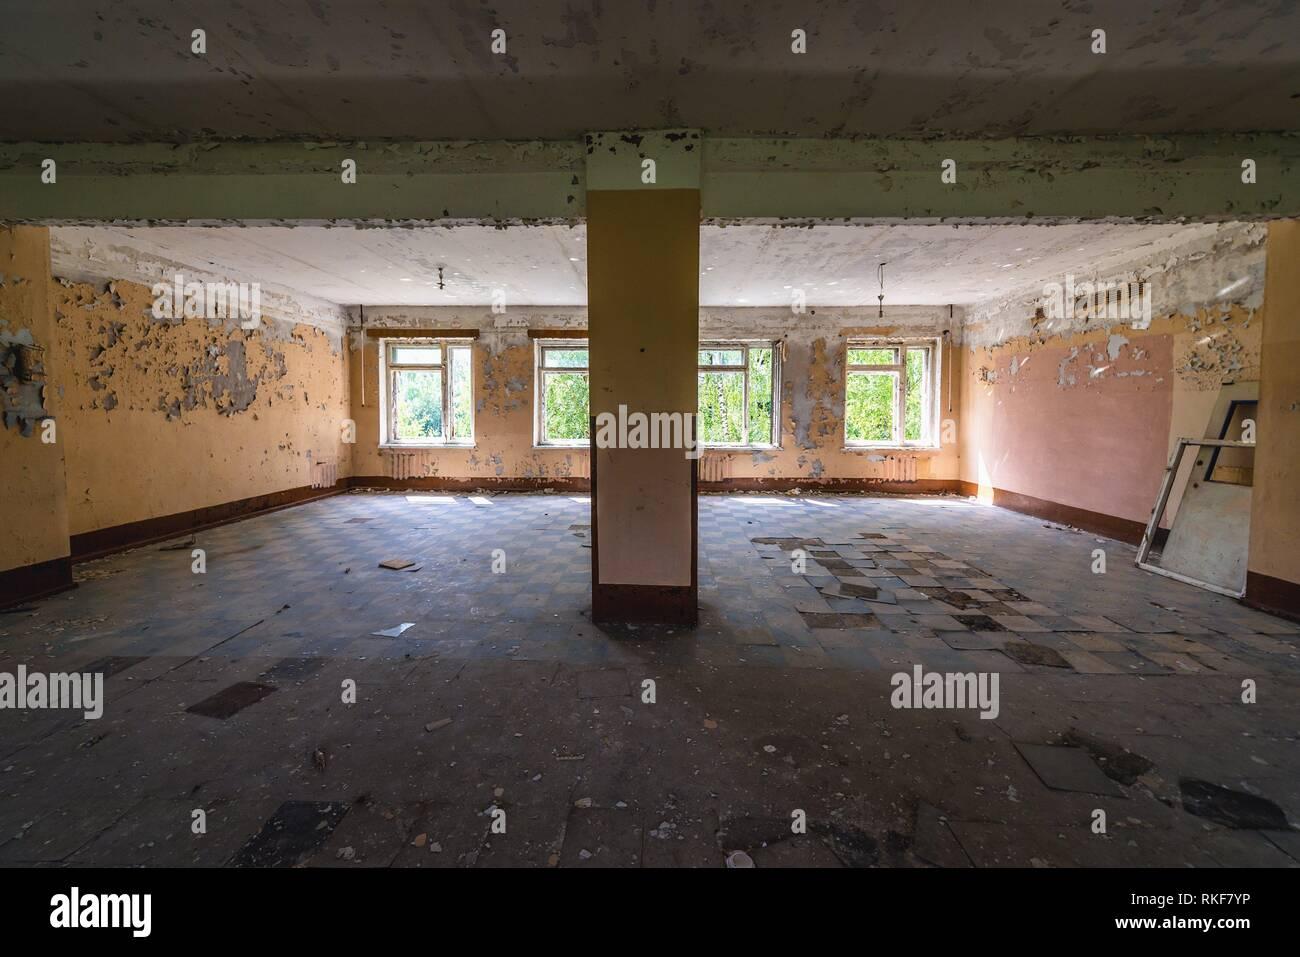 Interior of army barrack building in Skrunda-1 ghost town, former site of Soviet Dnepr radar station from near Skrunda town in Latvia. - Stock Image